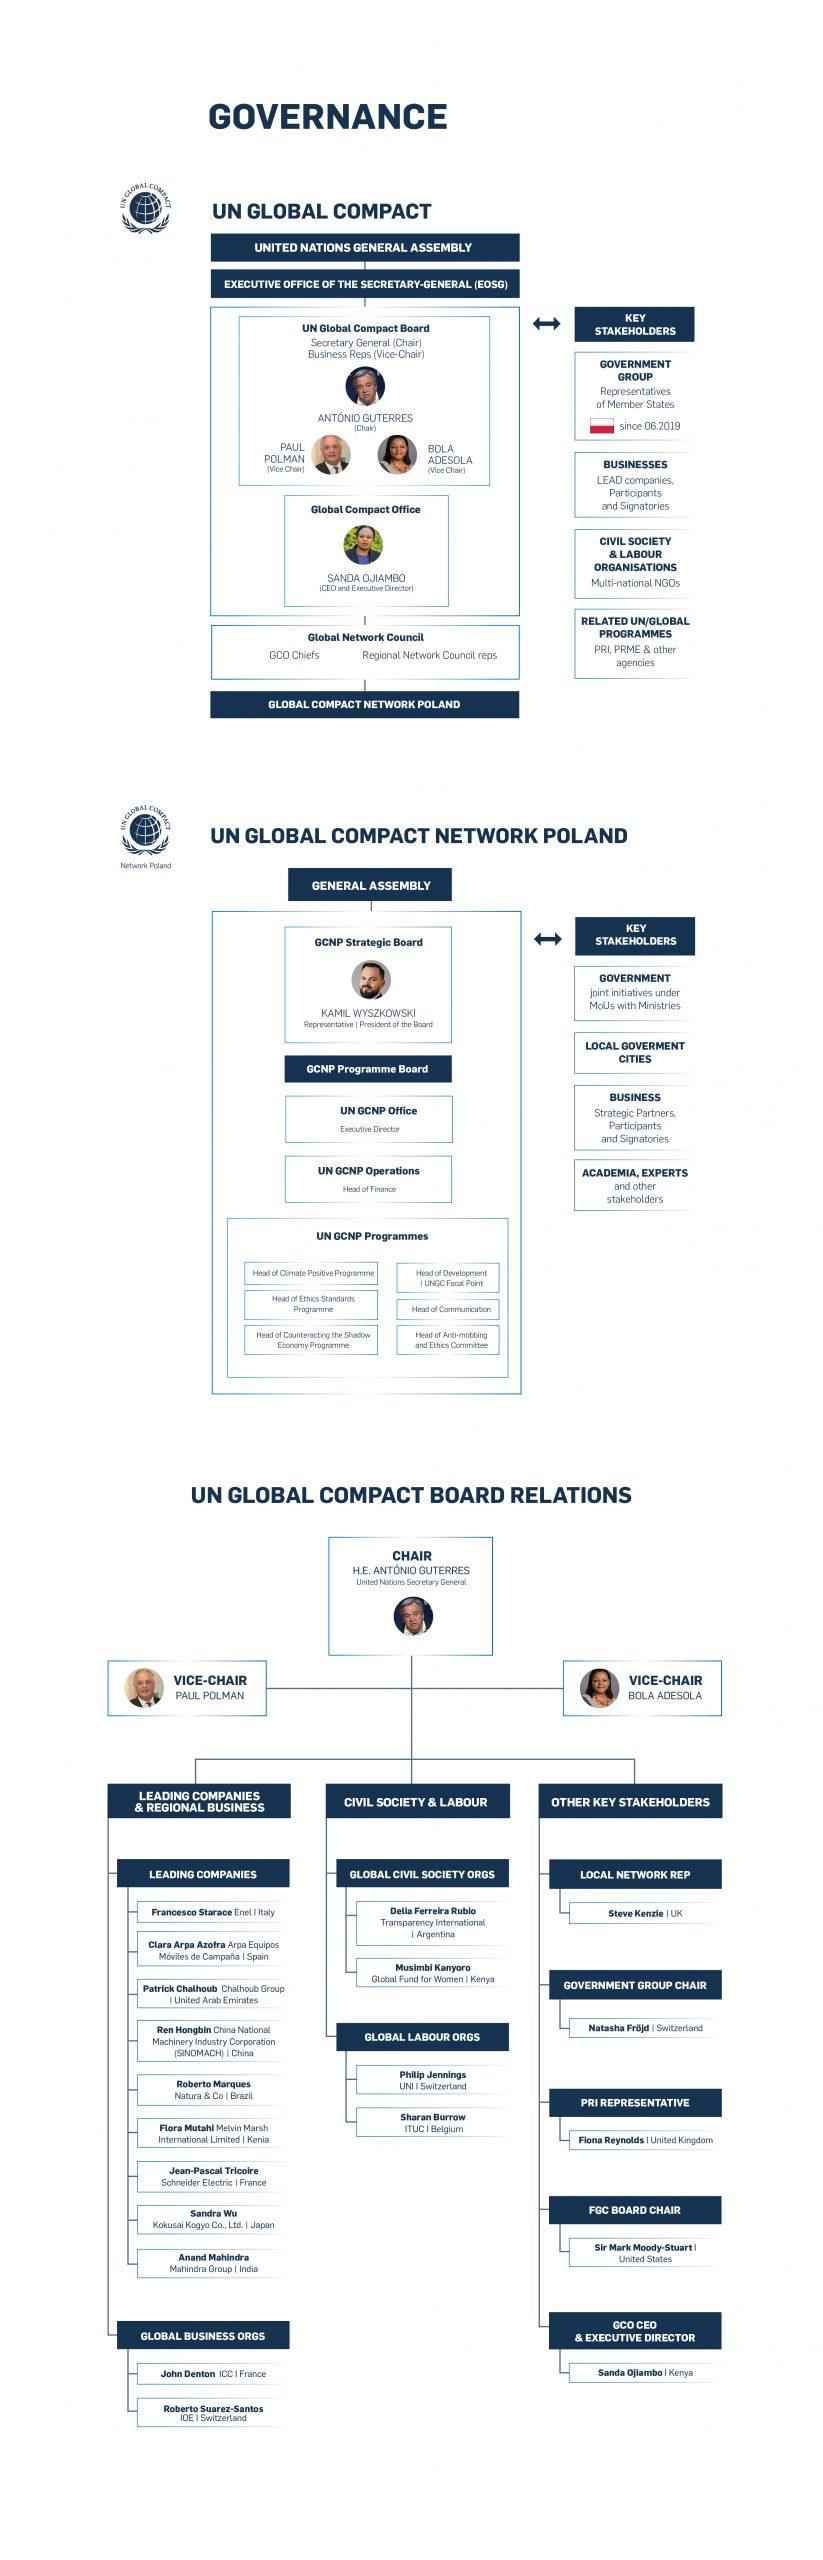 Struktura UNGC